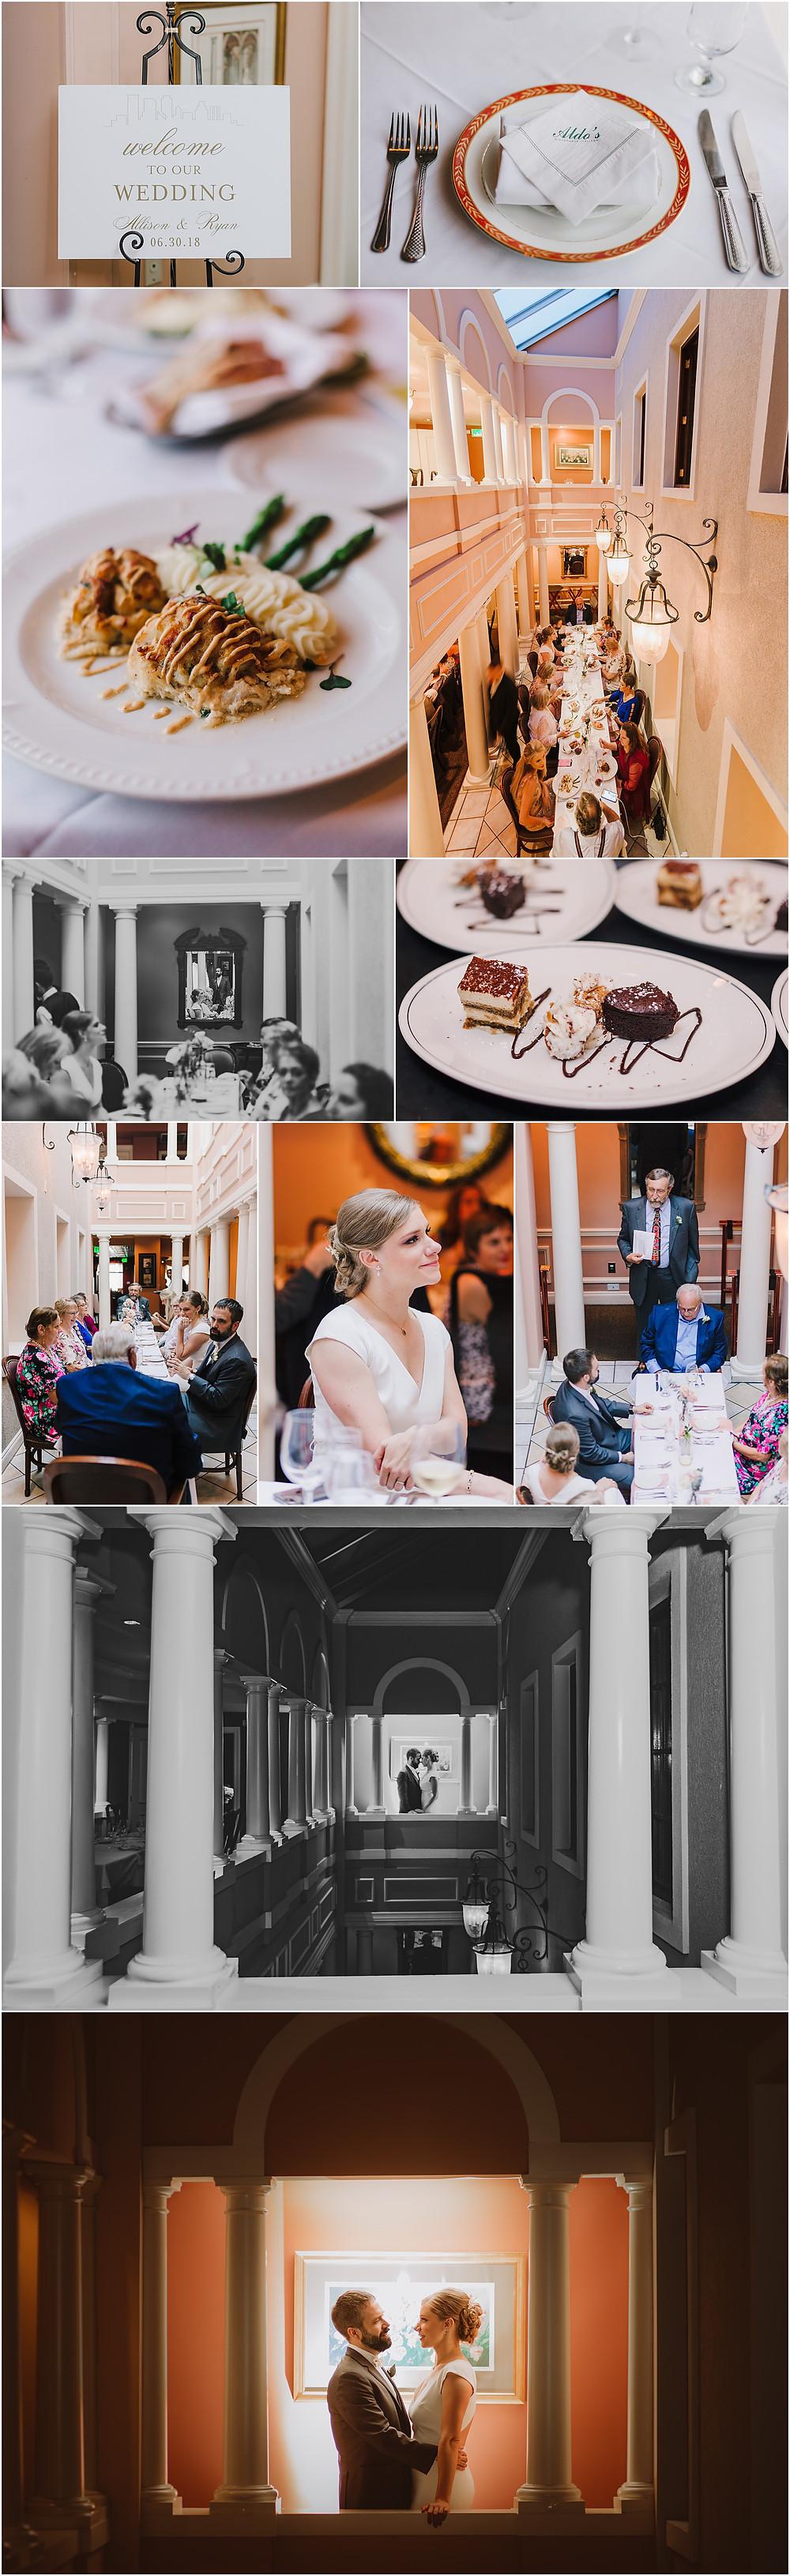 Intimate Wedding Reception at Aldo's Little Italy Restaurant - Baltimore Wedding Photography